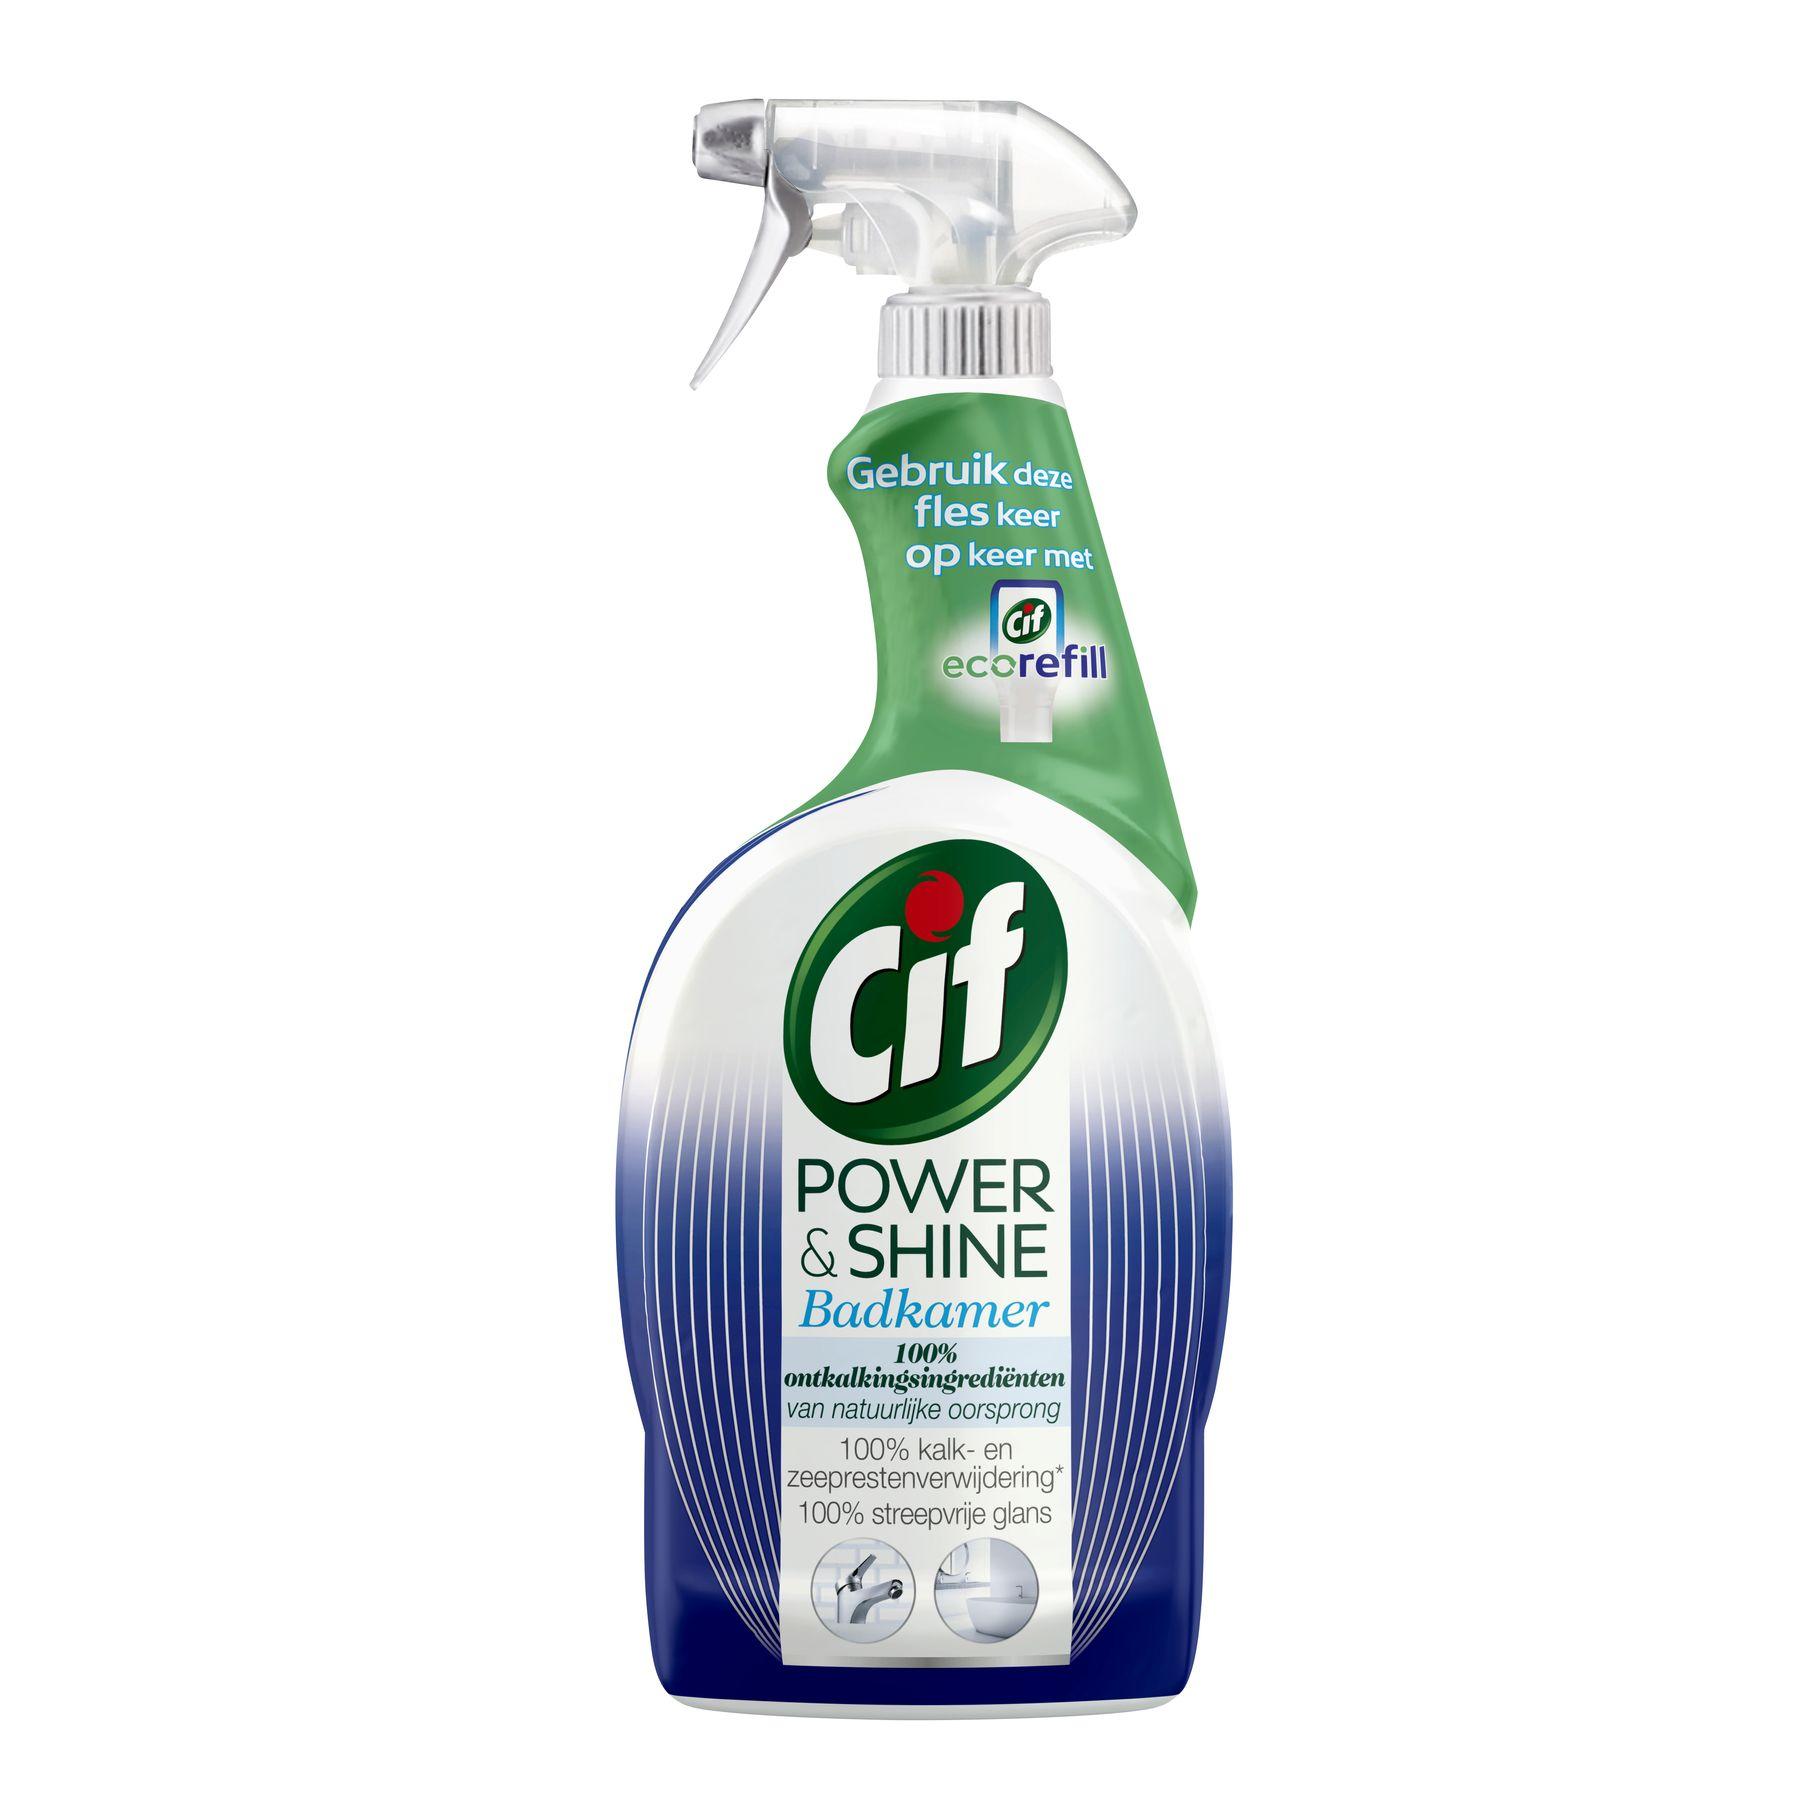 Cif Power & Shine Badkamer Spray 750ml